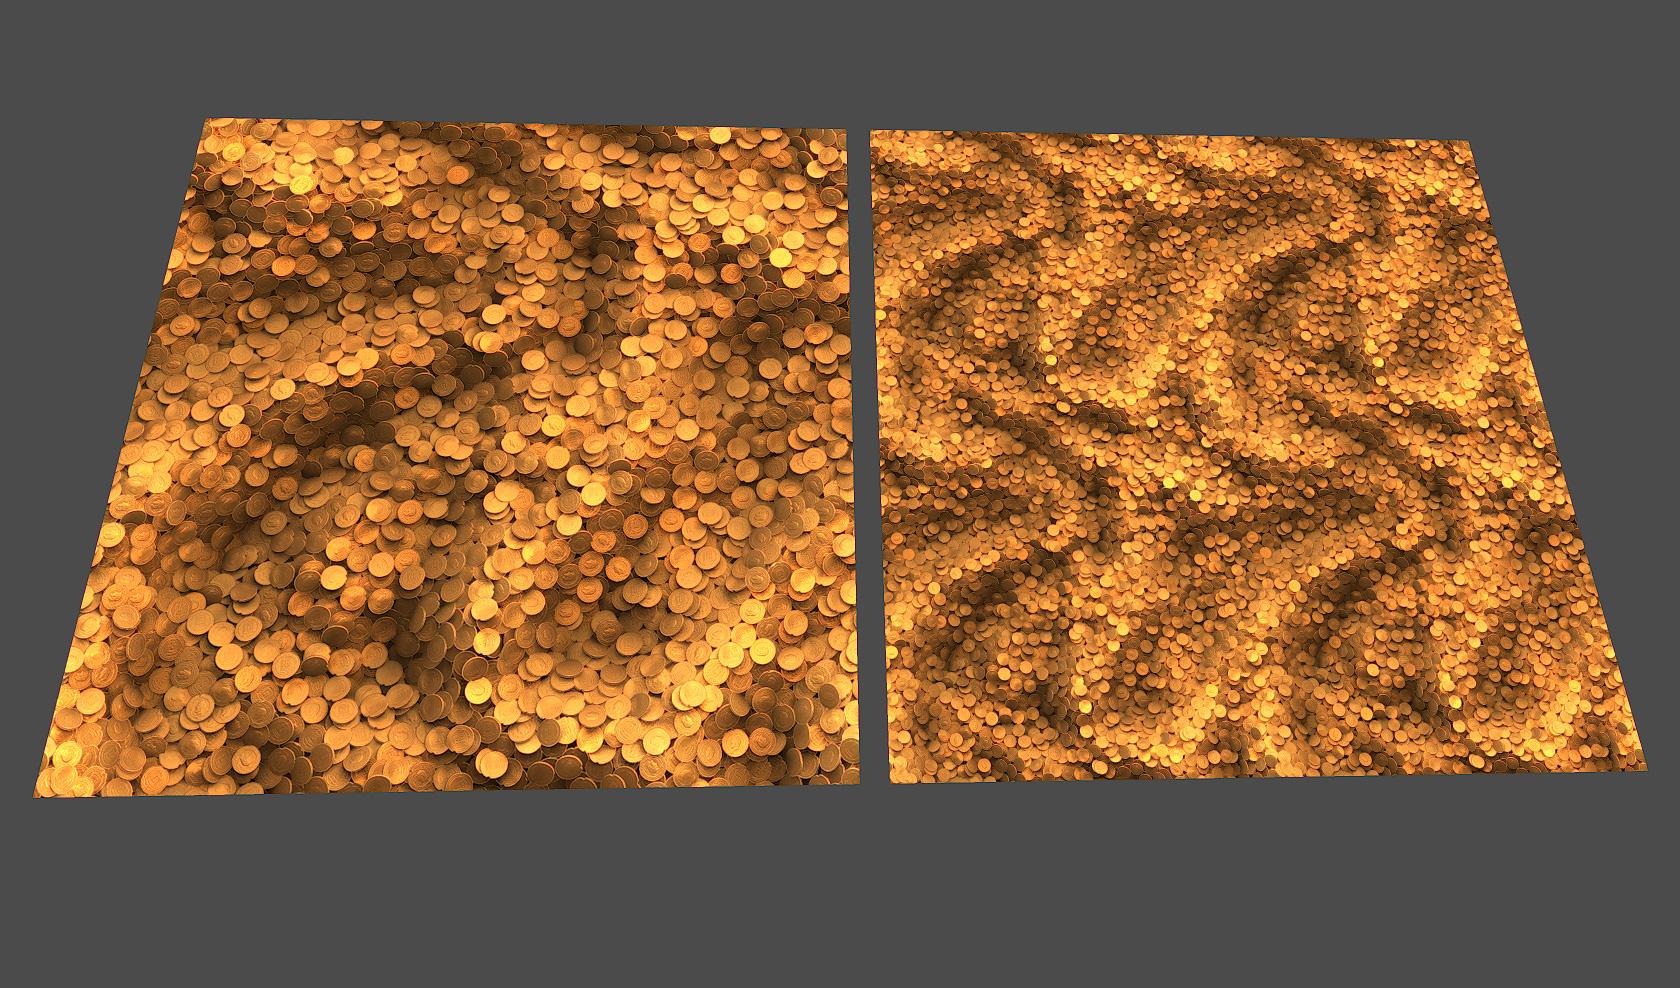 20120827_gold_coins_b_render.jpg